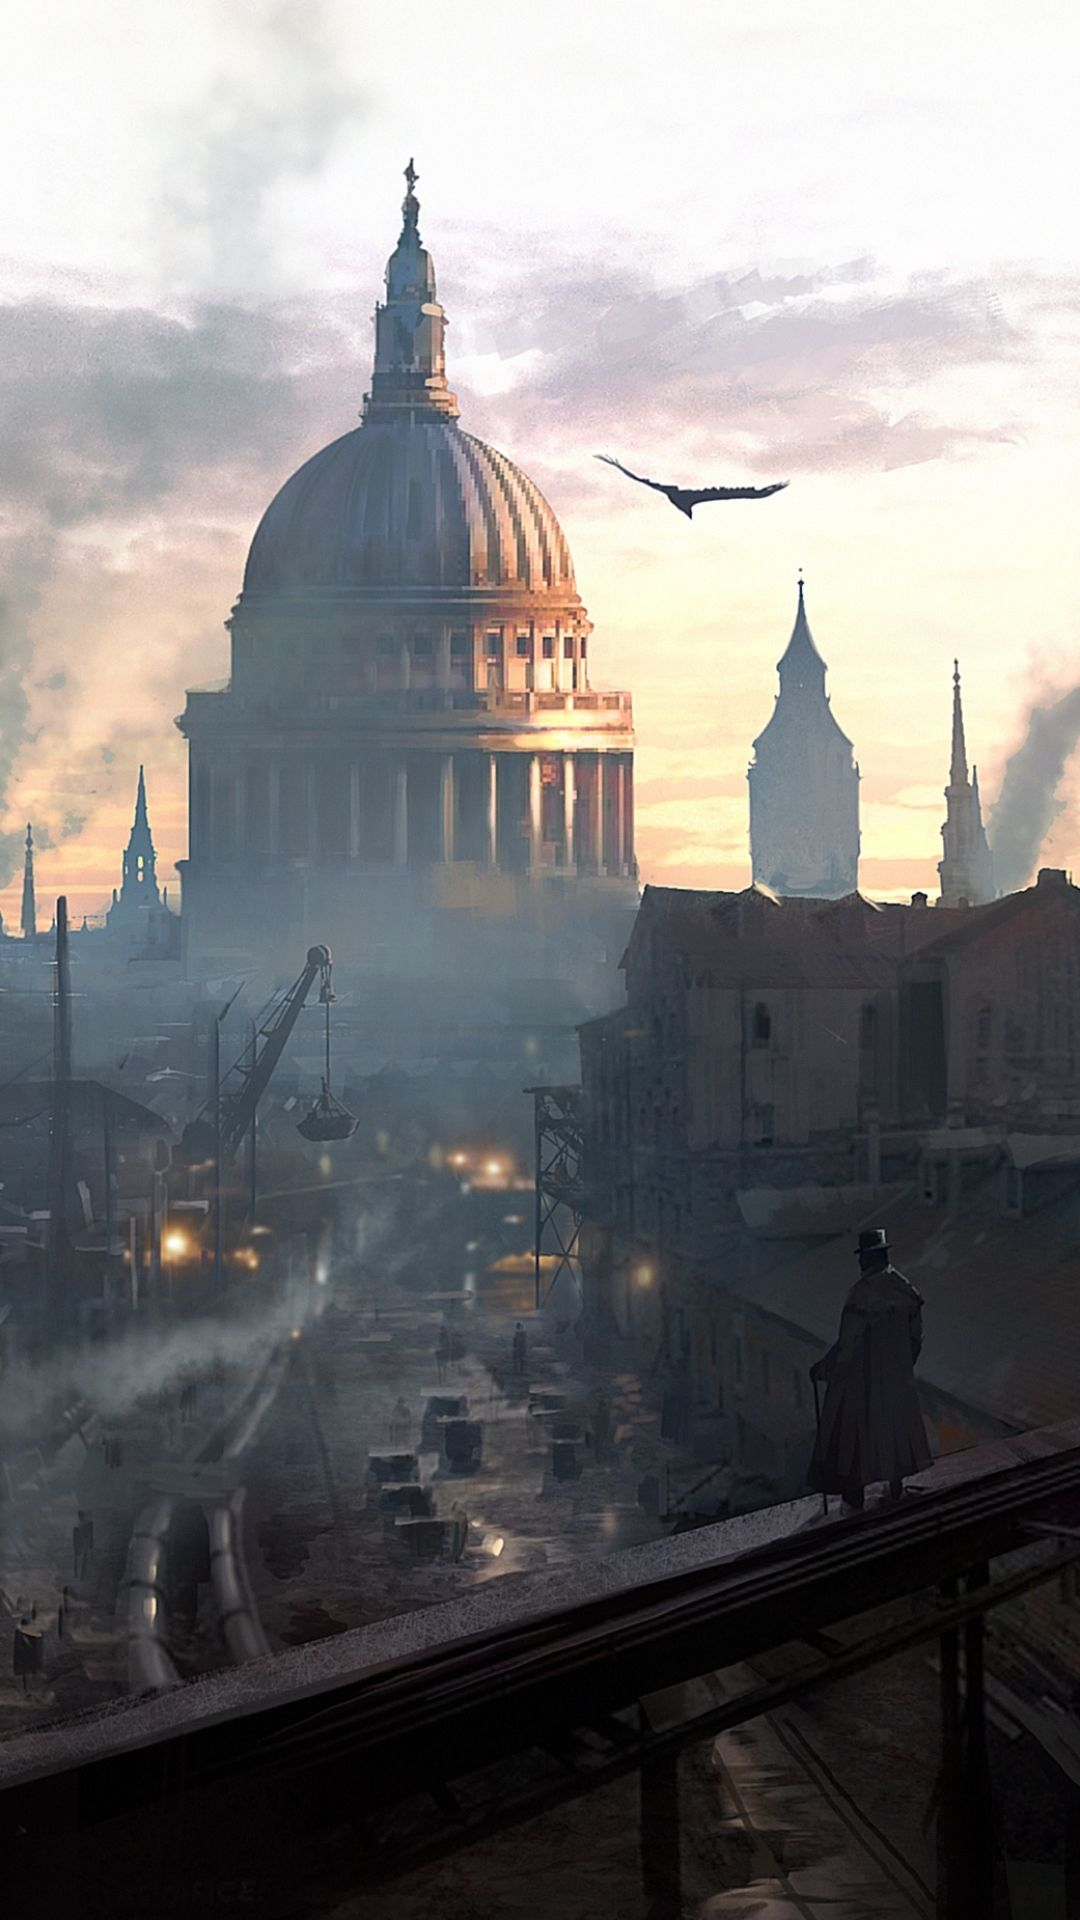 Hd Wallpaper 3 Assassin Creed 3 Pinterest Assassins Creed